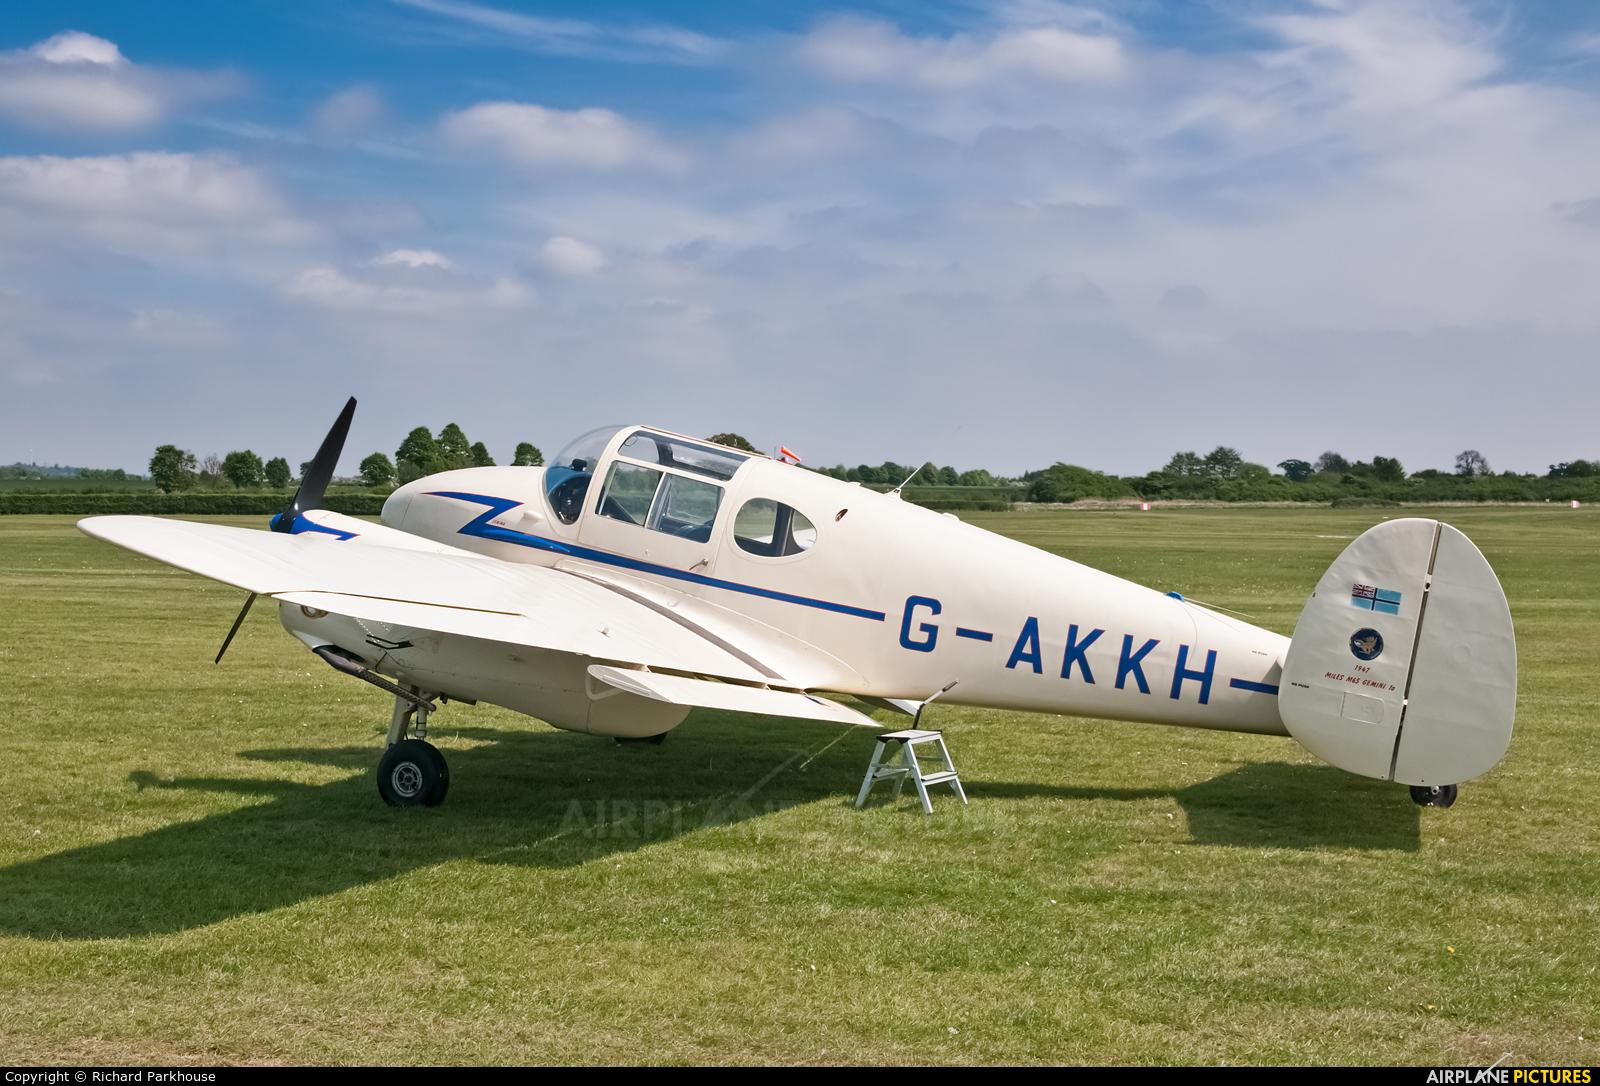 Private G-AKKH aircraft at Old Warden